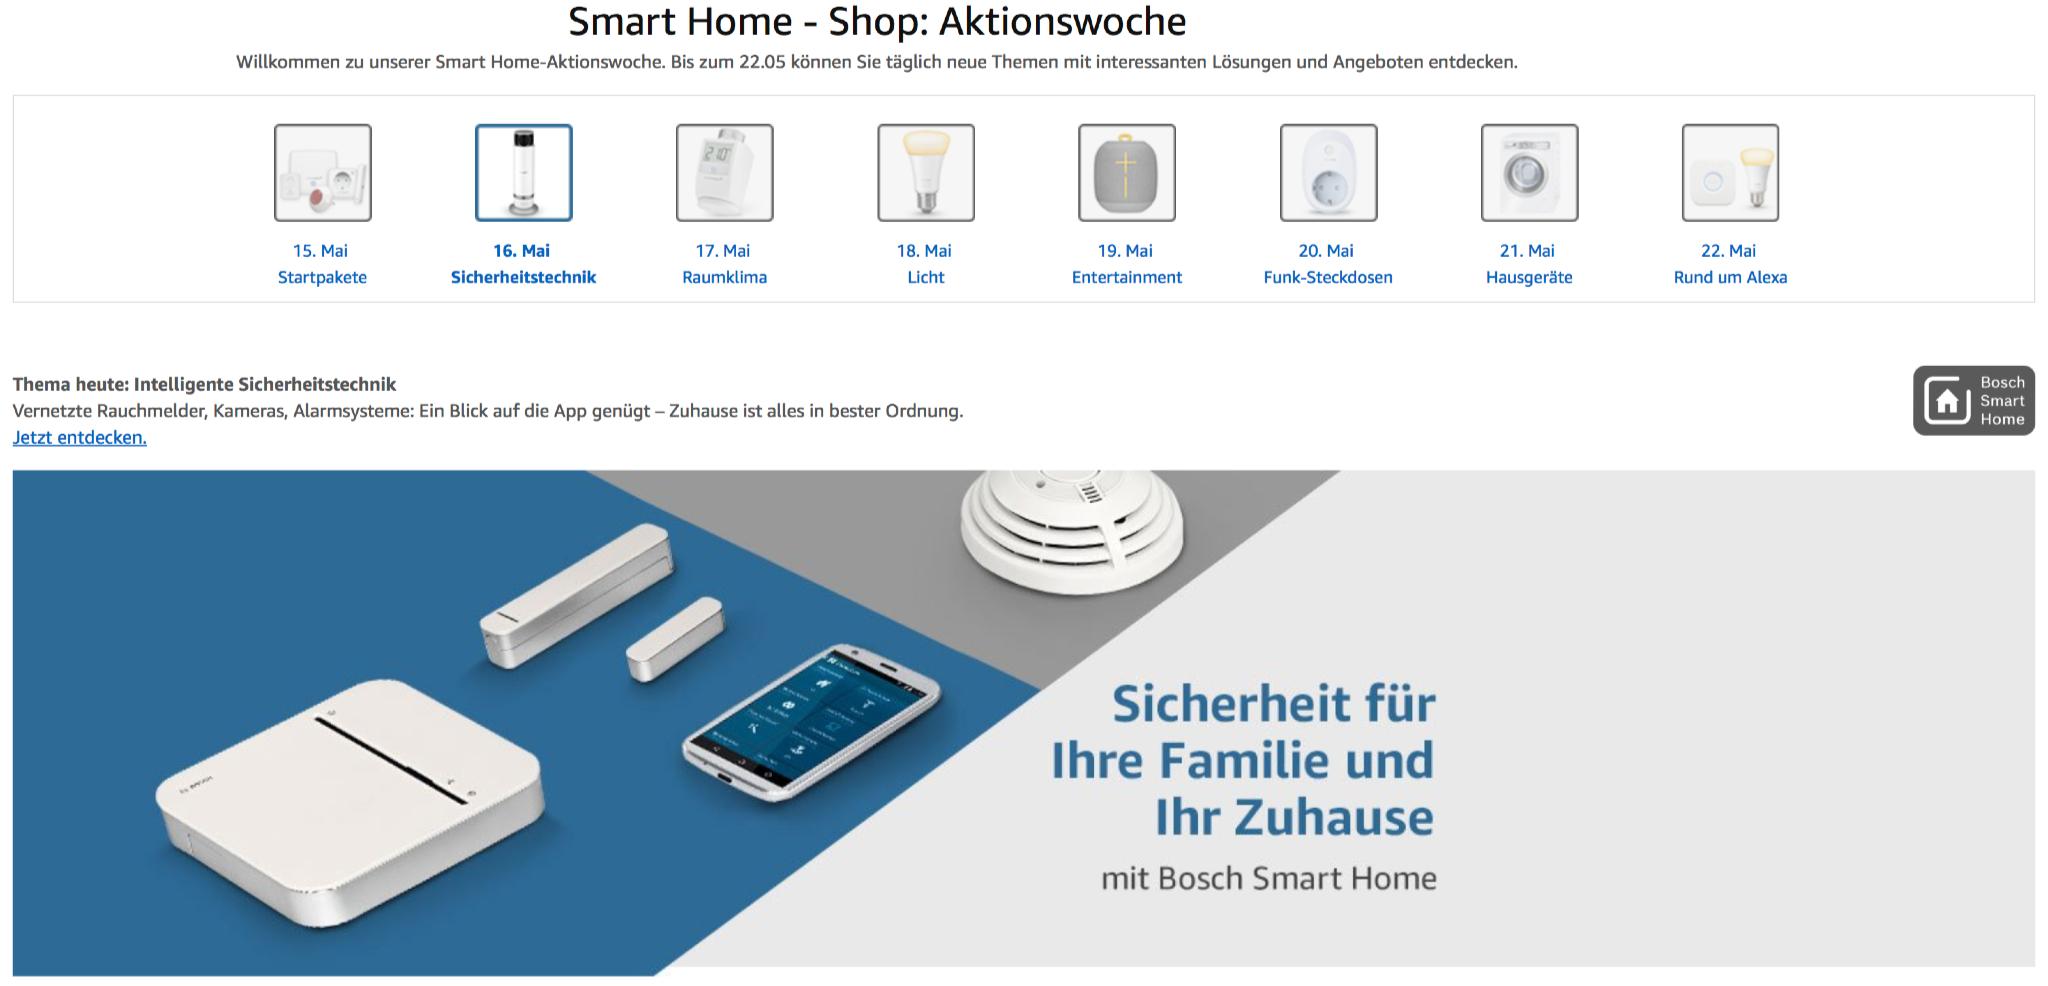 amazon reduziert smart home produkte u a nest kamera elgato eve thermo sicherheitstechnik. Black Bedroom Furniture Sets. Home Design Ideas